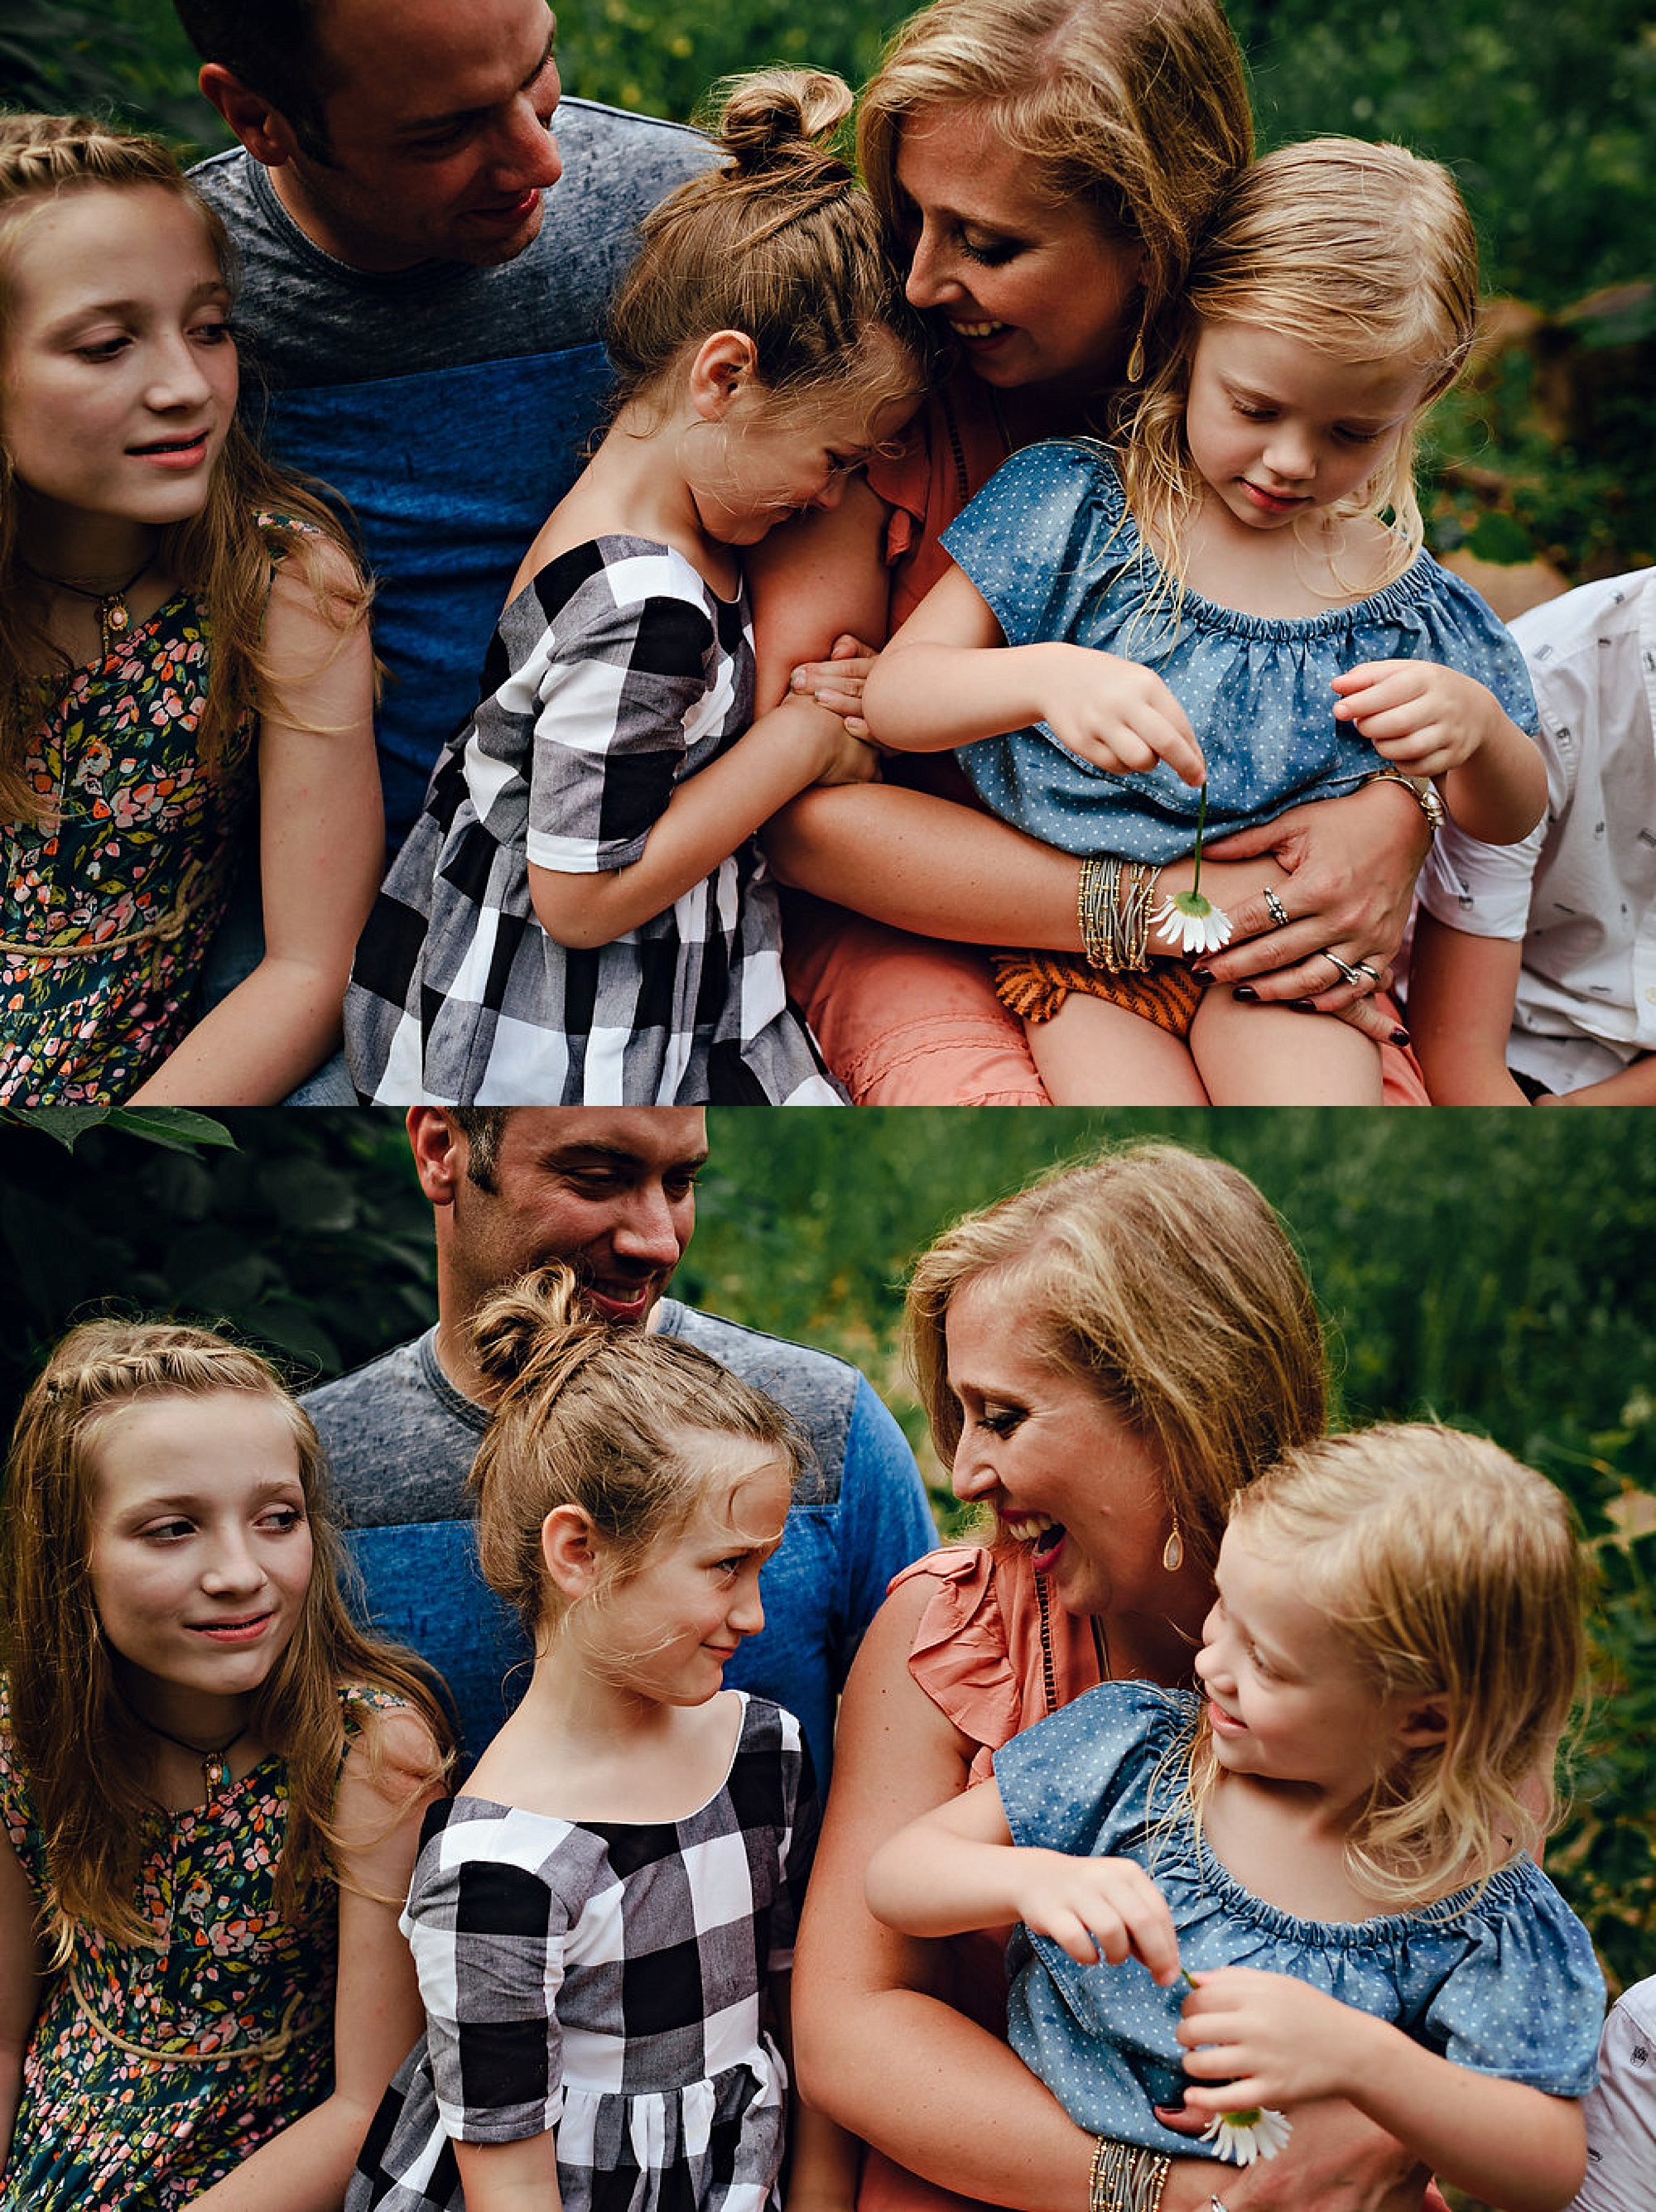 bandy-family-lauren-grayson-akron-ohio_0036.jpg